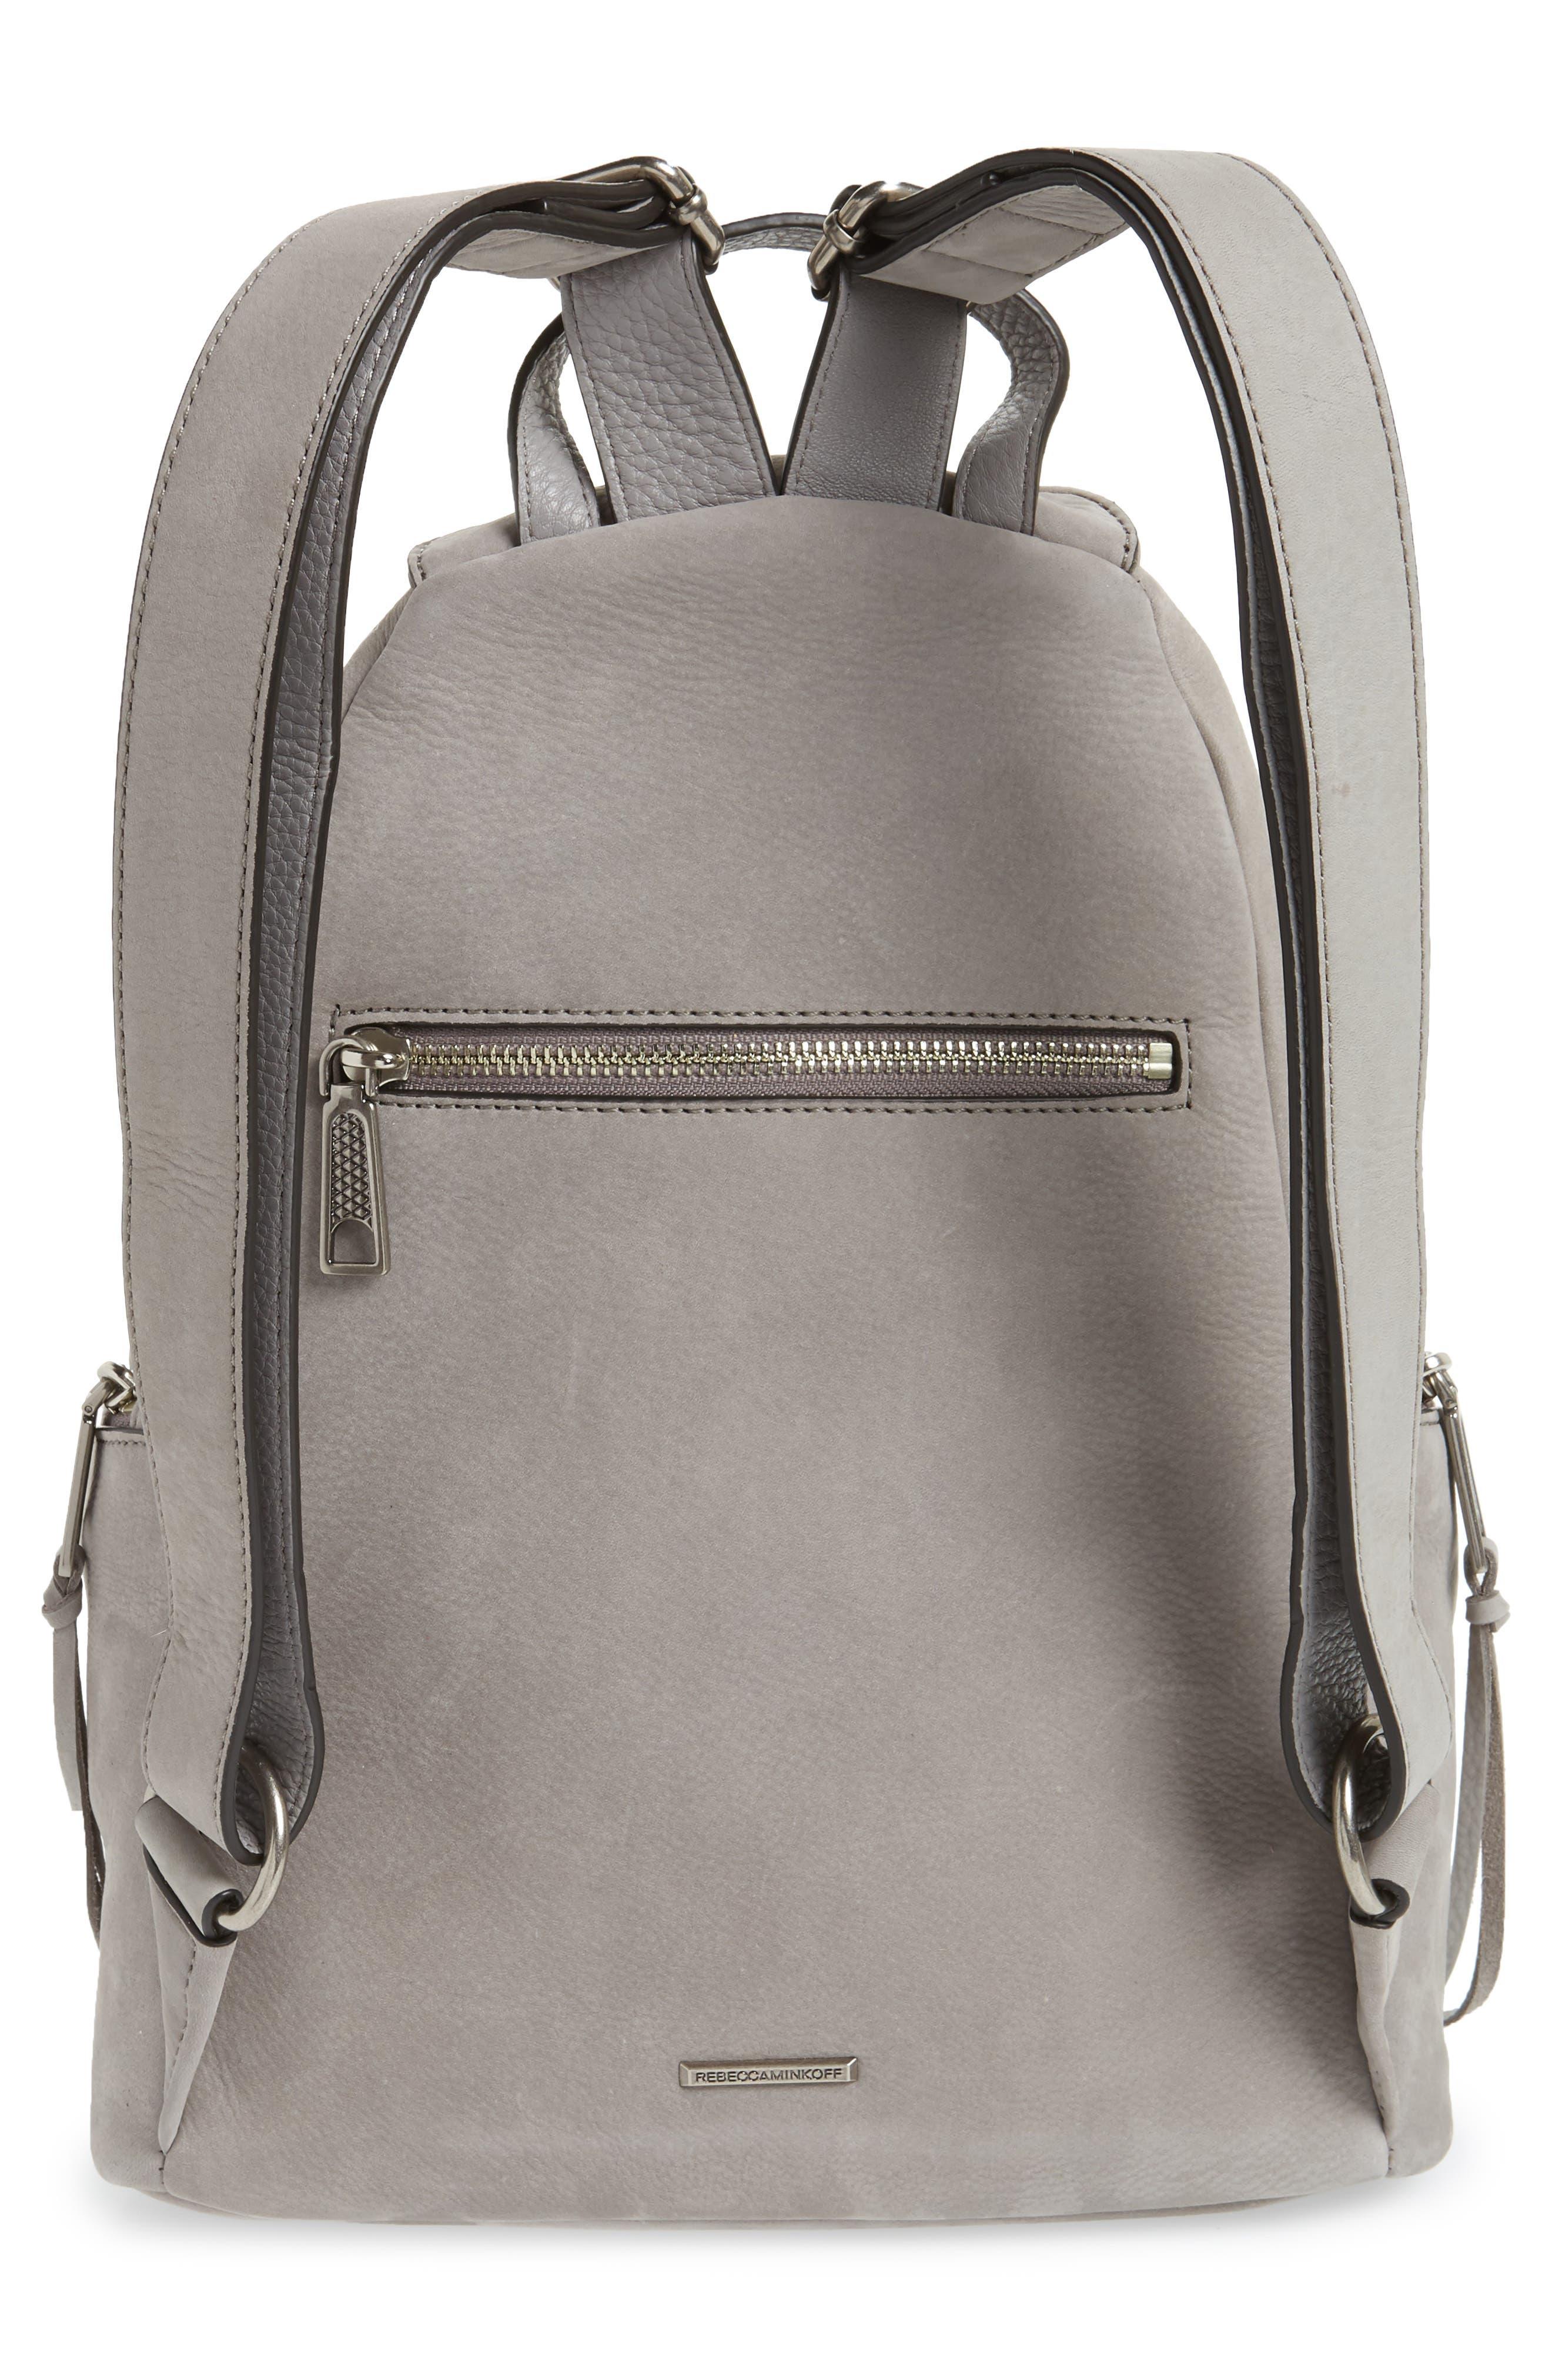 Julian Nubuck Leather Backpack,                             Alternate thumbnail 3, color,                             Grey